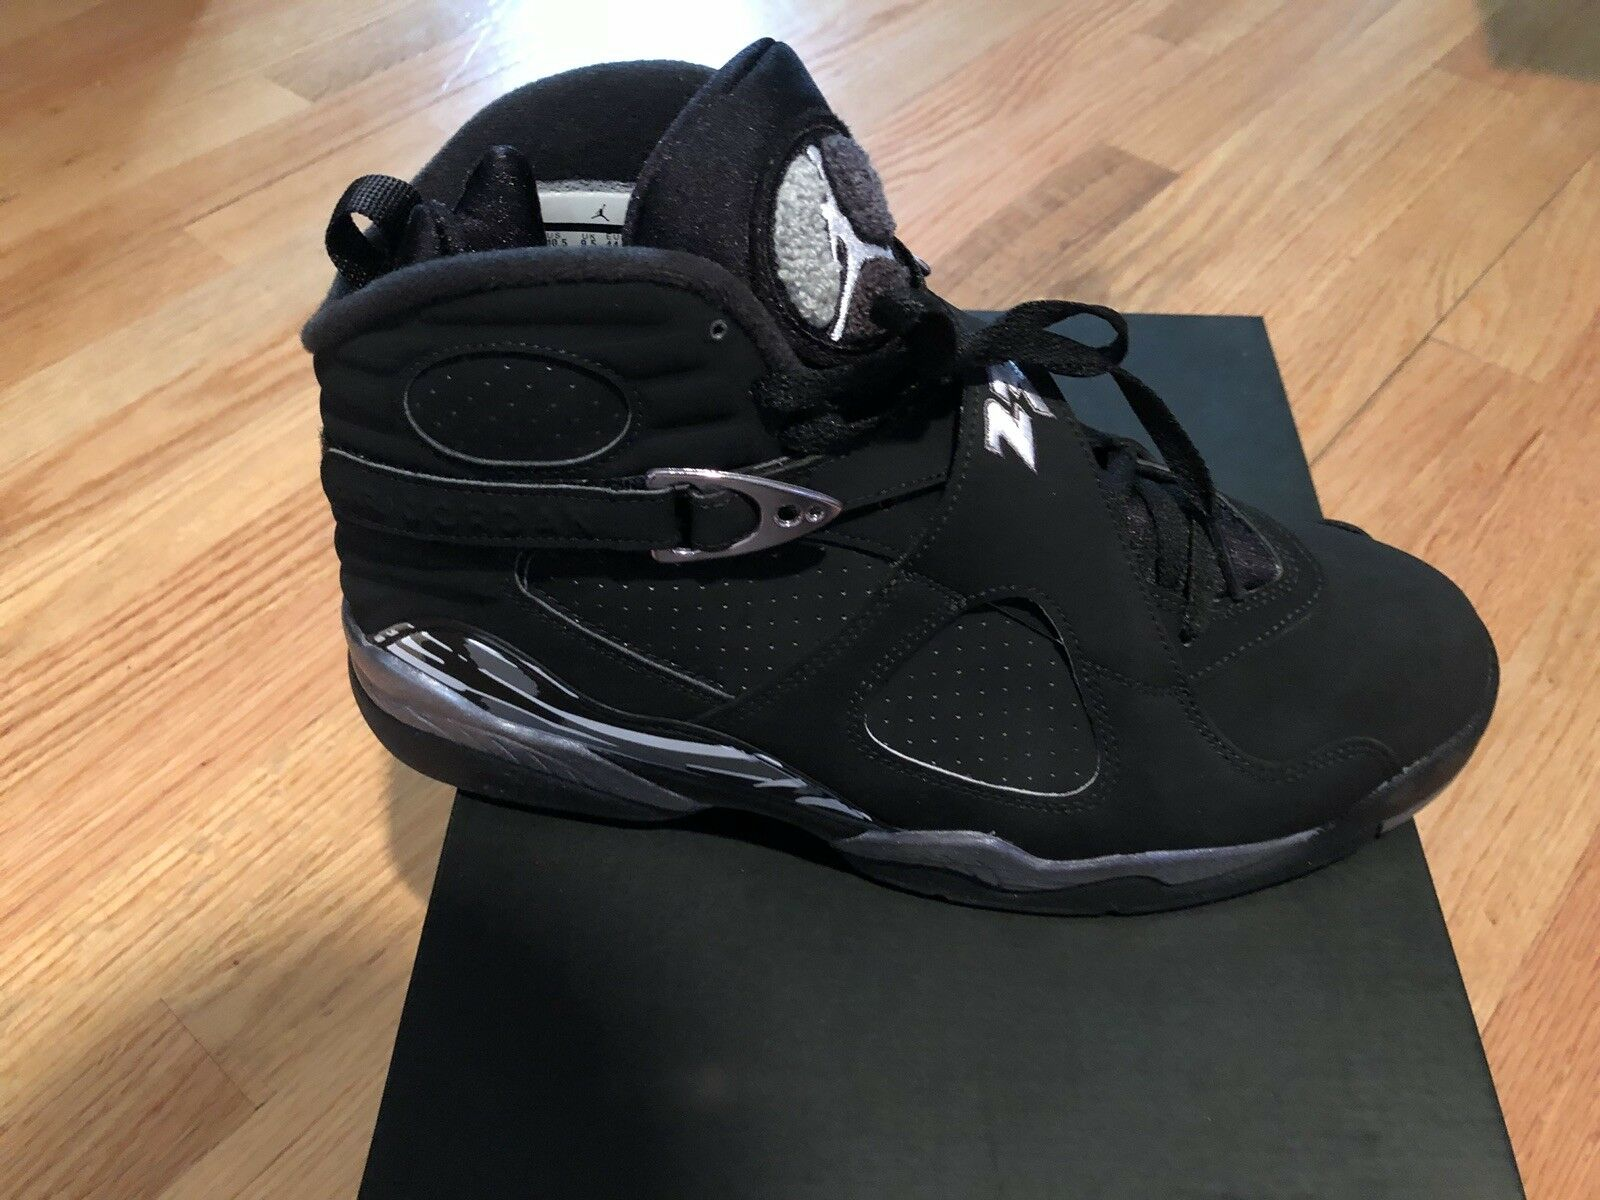 Air Jordan Retro 6 Chrome Size 10.5